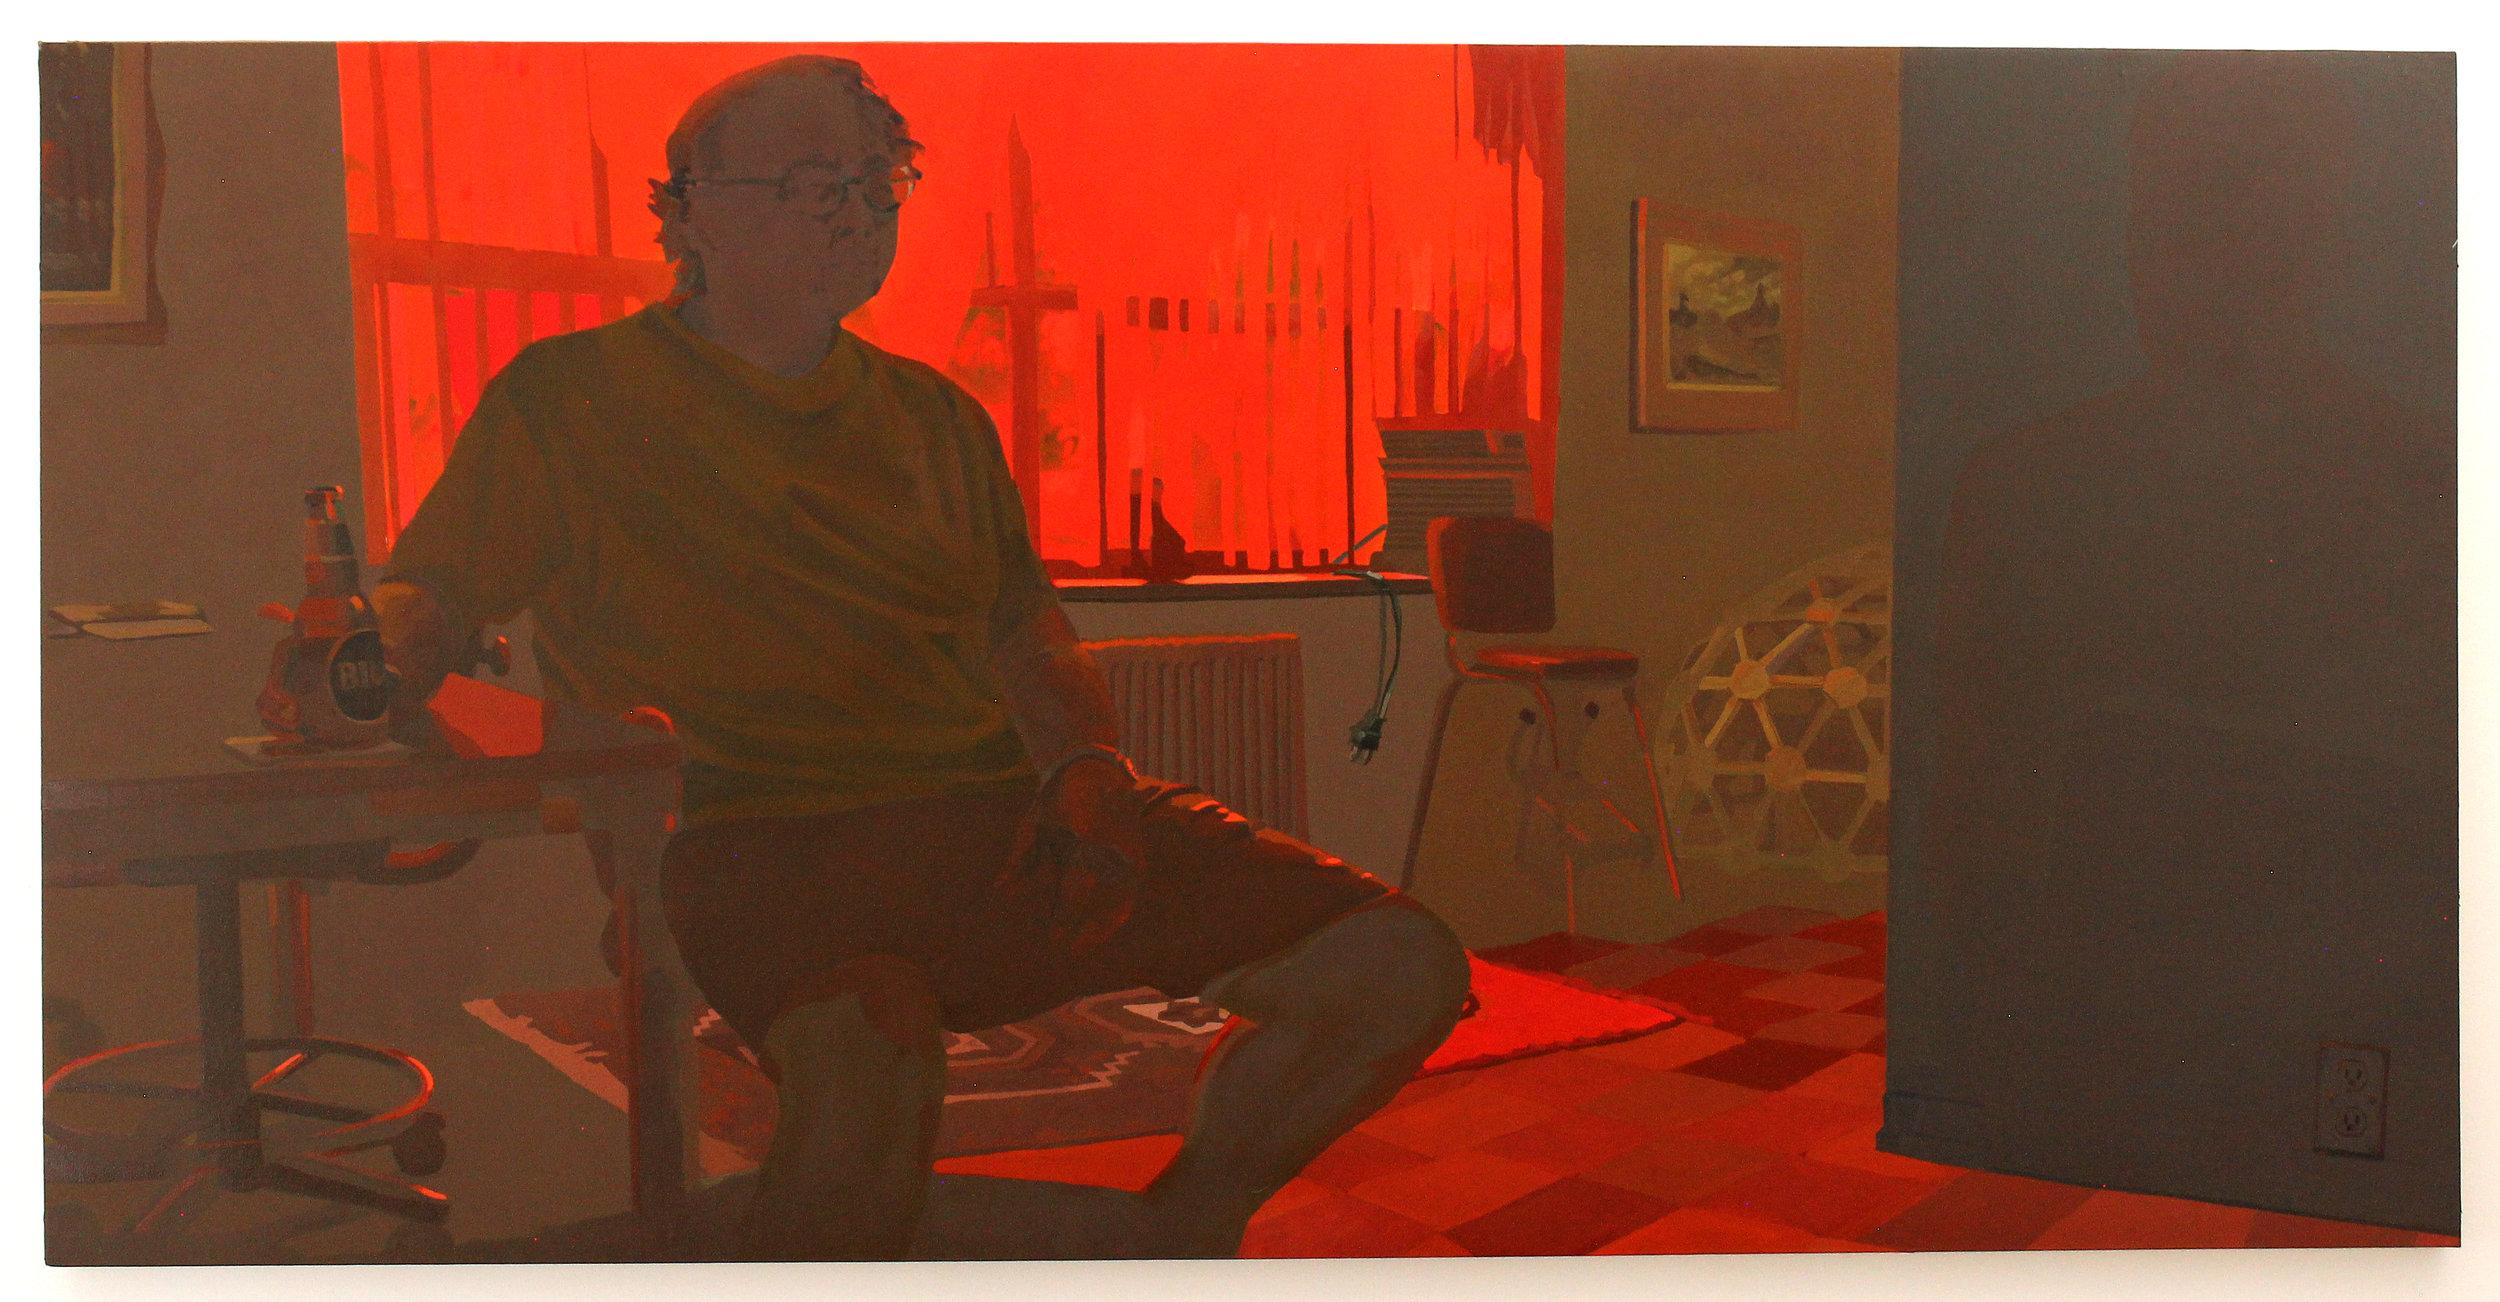 Keiran Brennan Hinton,  Extending the Day , 2017,48 x 96 inches